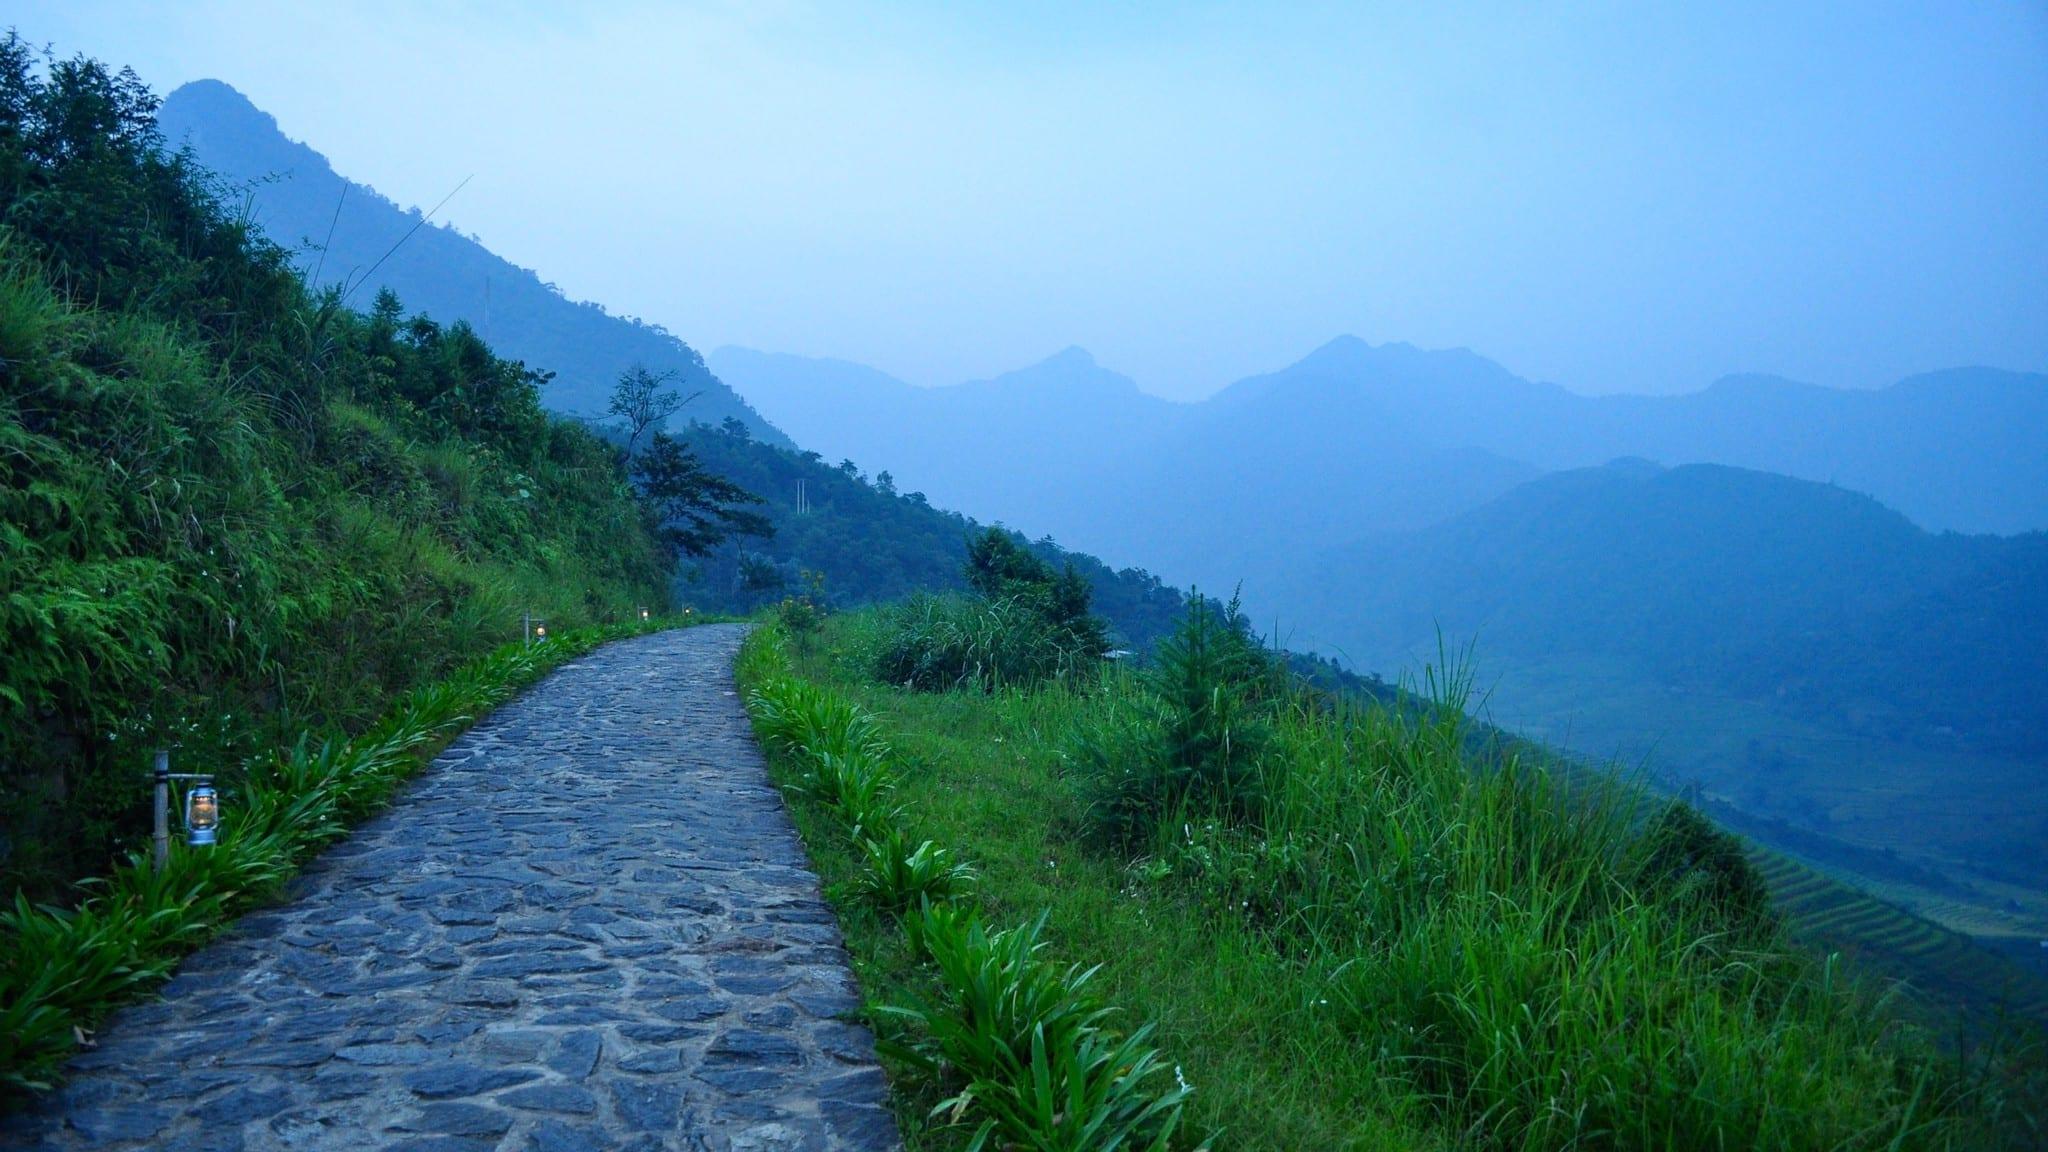 Image of the Lao Cai Province in Vietnam, near Sapa